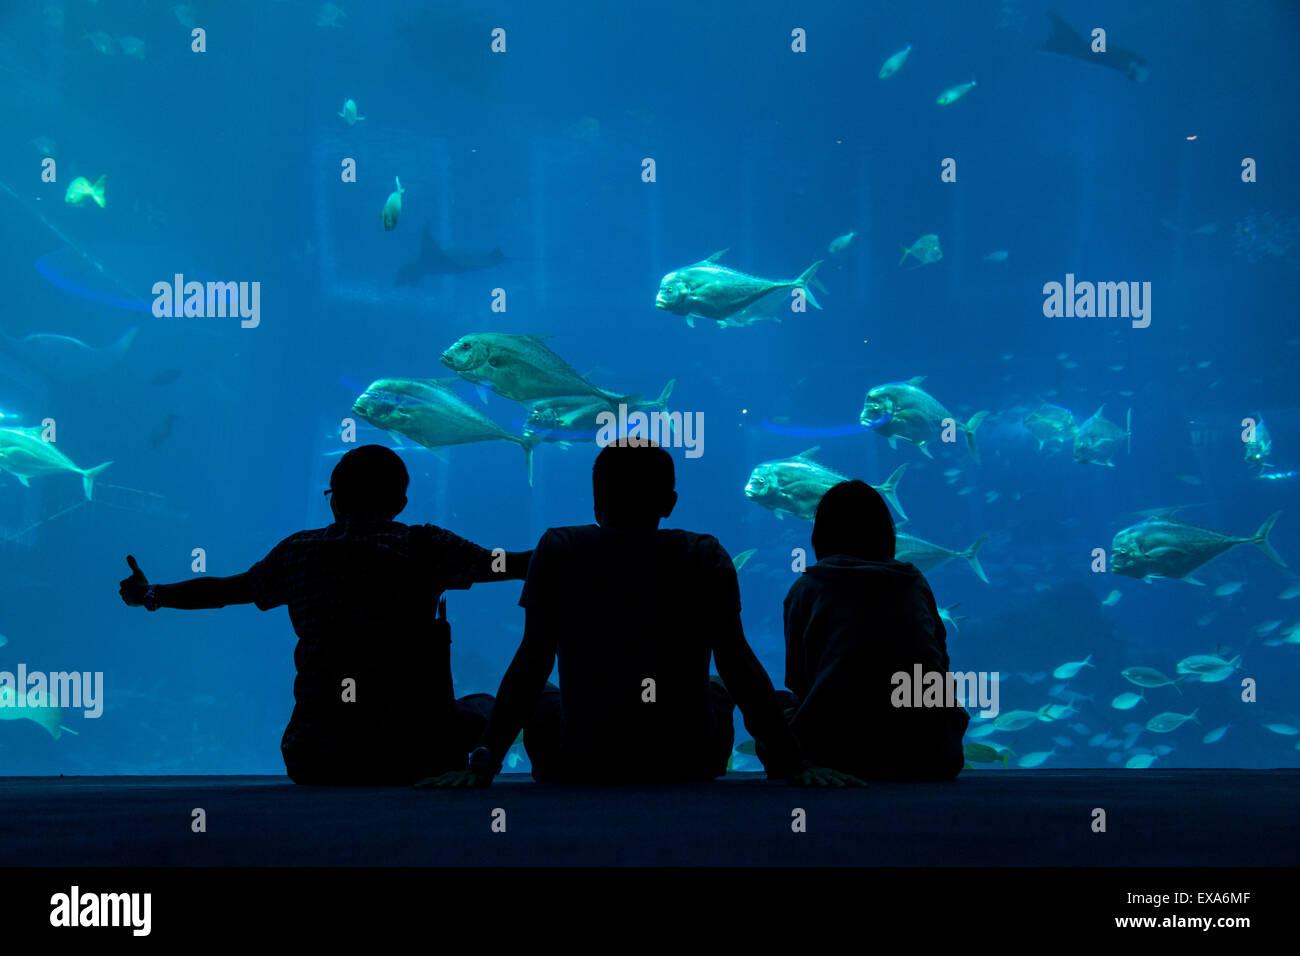 Aquarium fish tank singapore - Asia Singapore Silhouette Of Tourists Sitting In Front Of Massive Fish Tank Inside S E A Aquarium